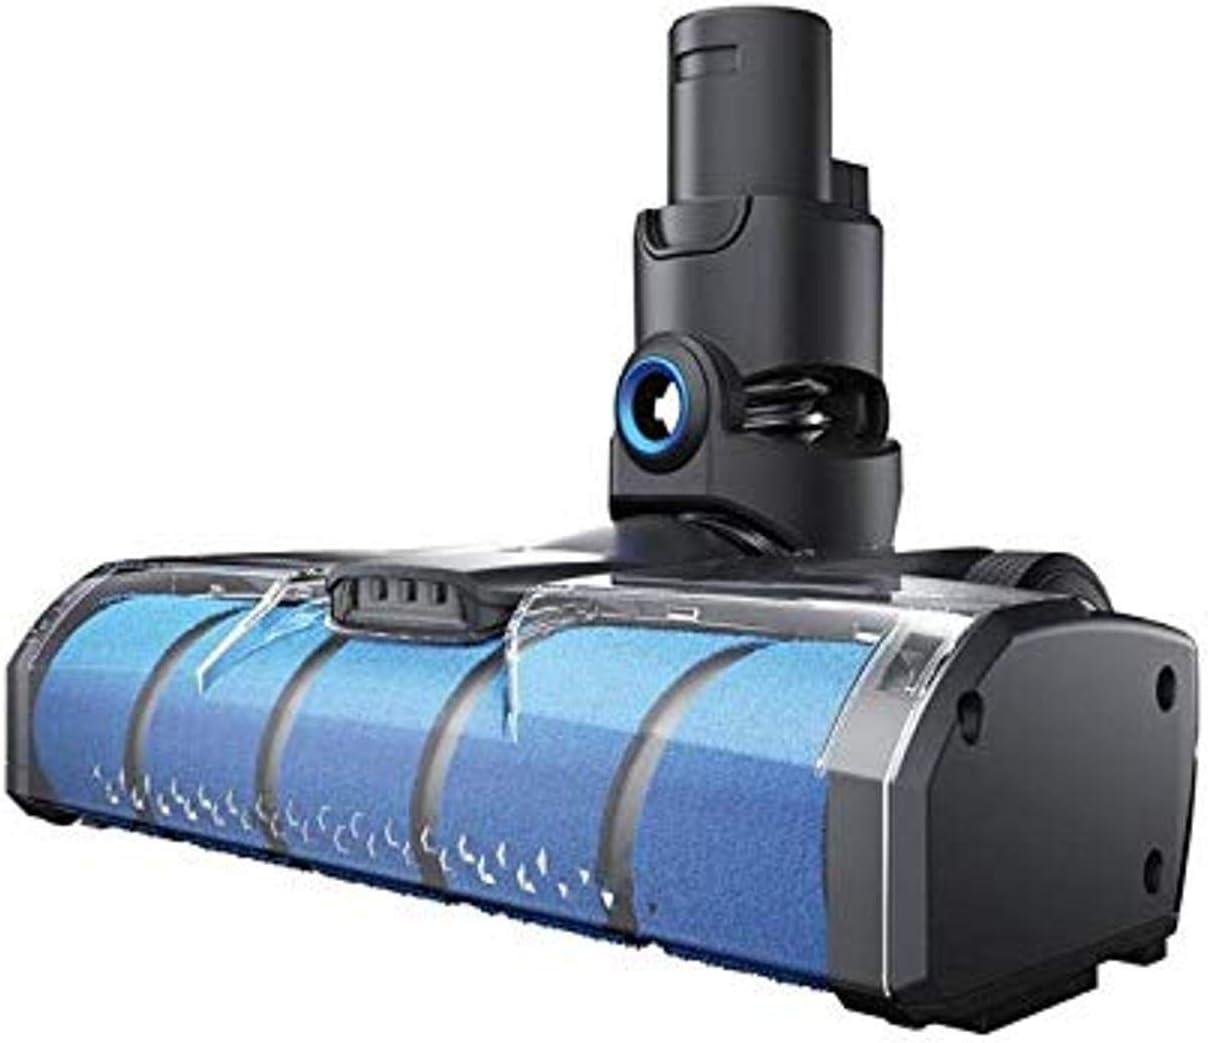 Hoover Blade Microfiber Hard Floor Nozzle, Black